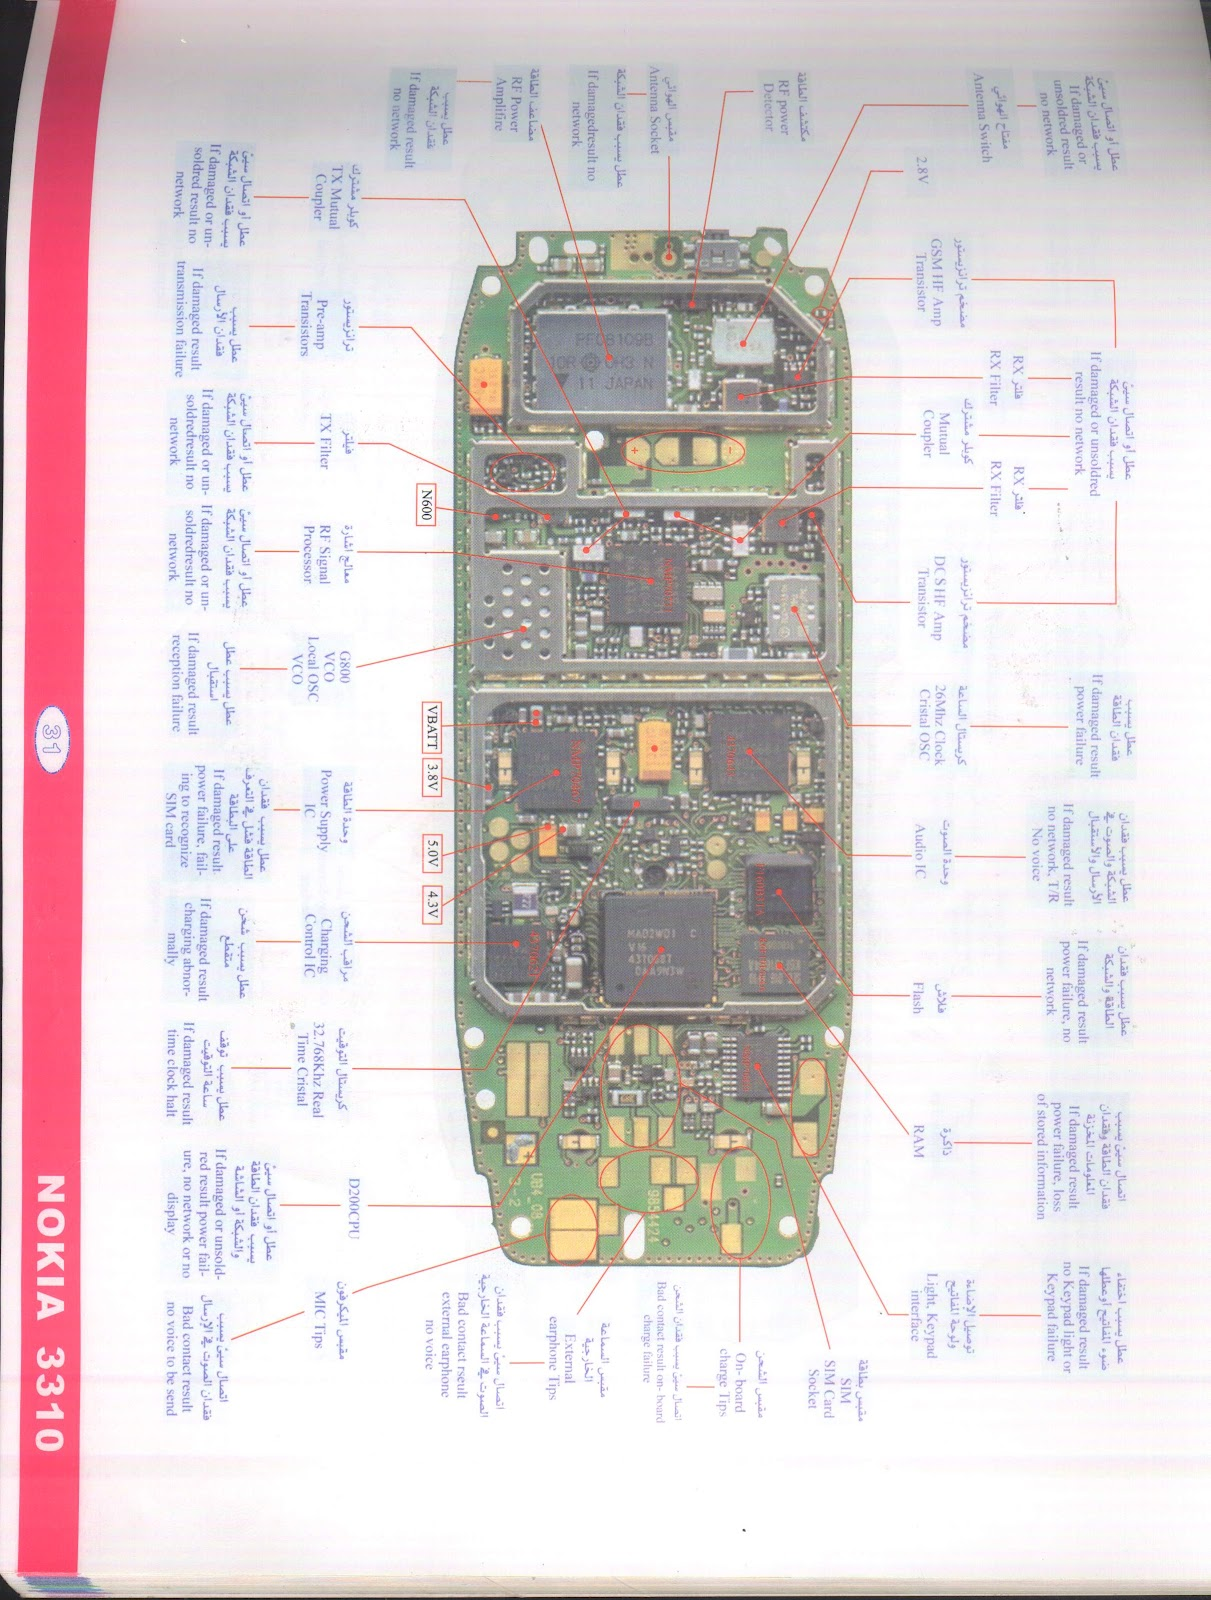 medium resolution of nokia 3210 circuit board details